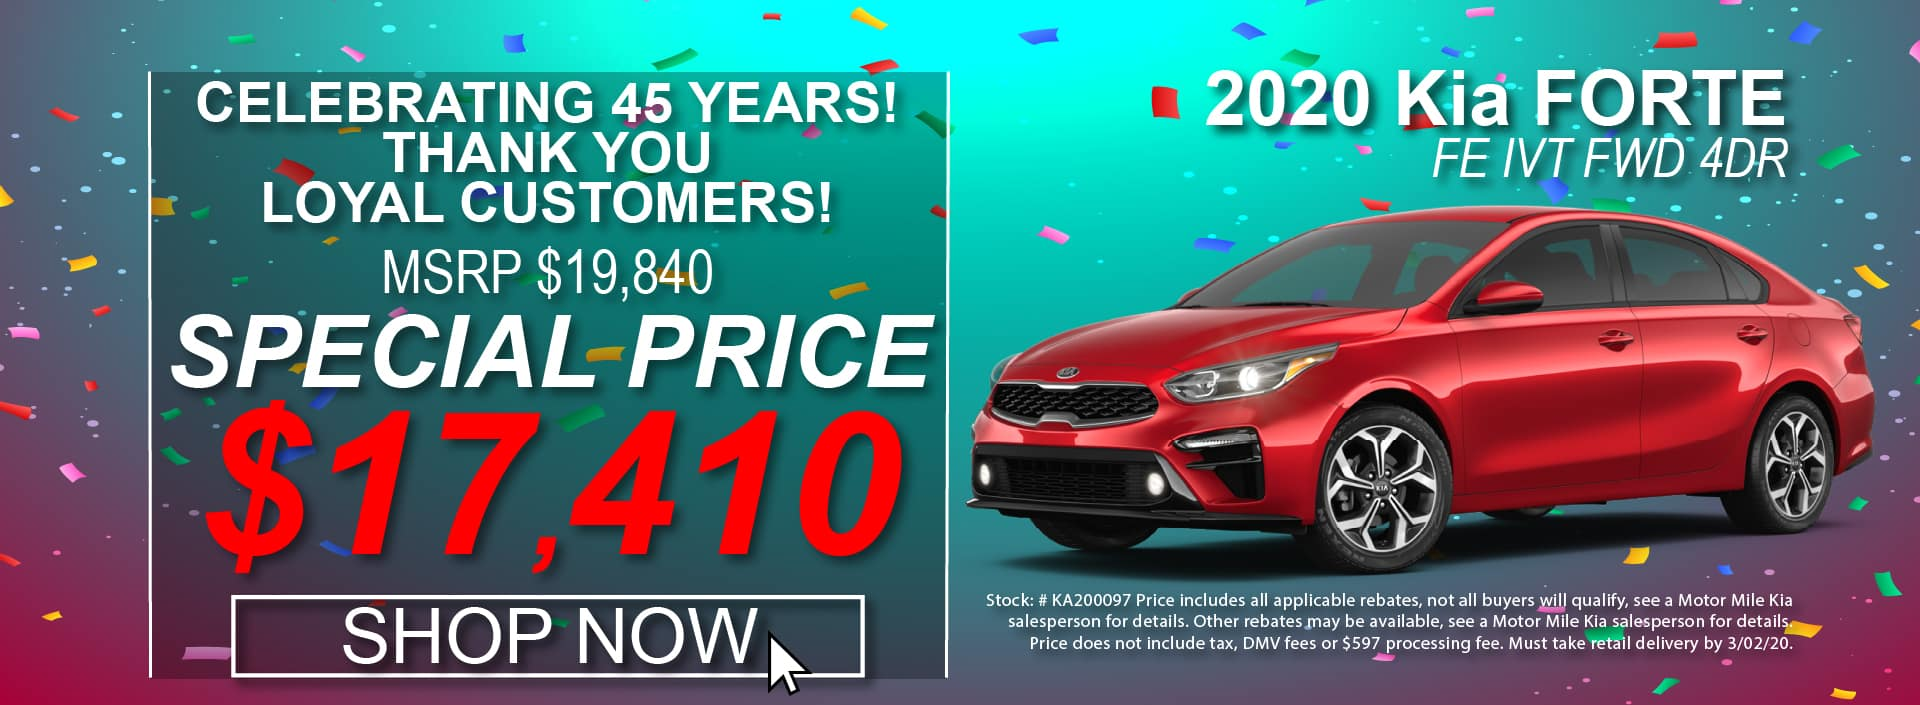 2020 Kia Forte Special Offers at Motor Mile Kia